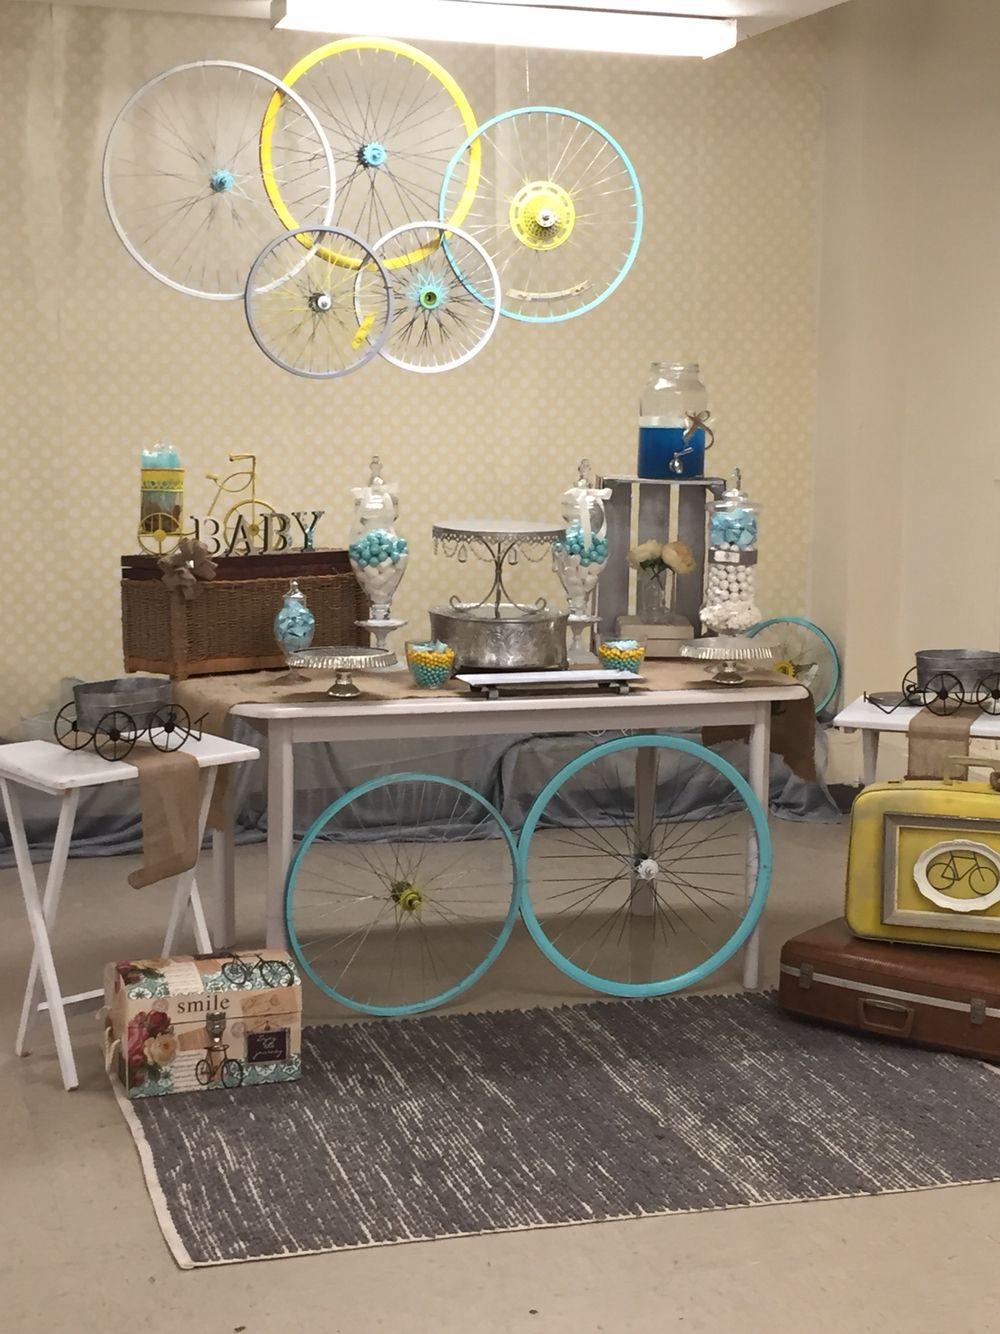 Baby Boy Vintage Bicycle Shower R Amp O Decor Pinterest